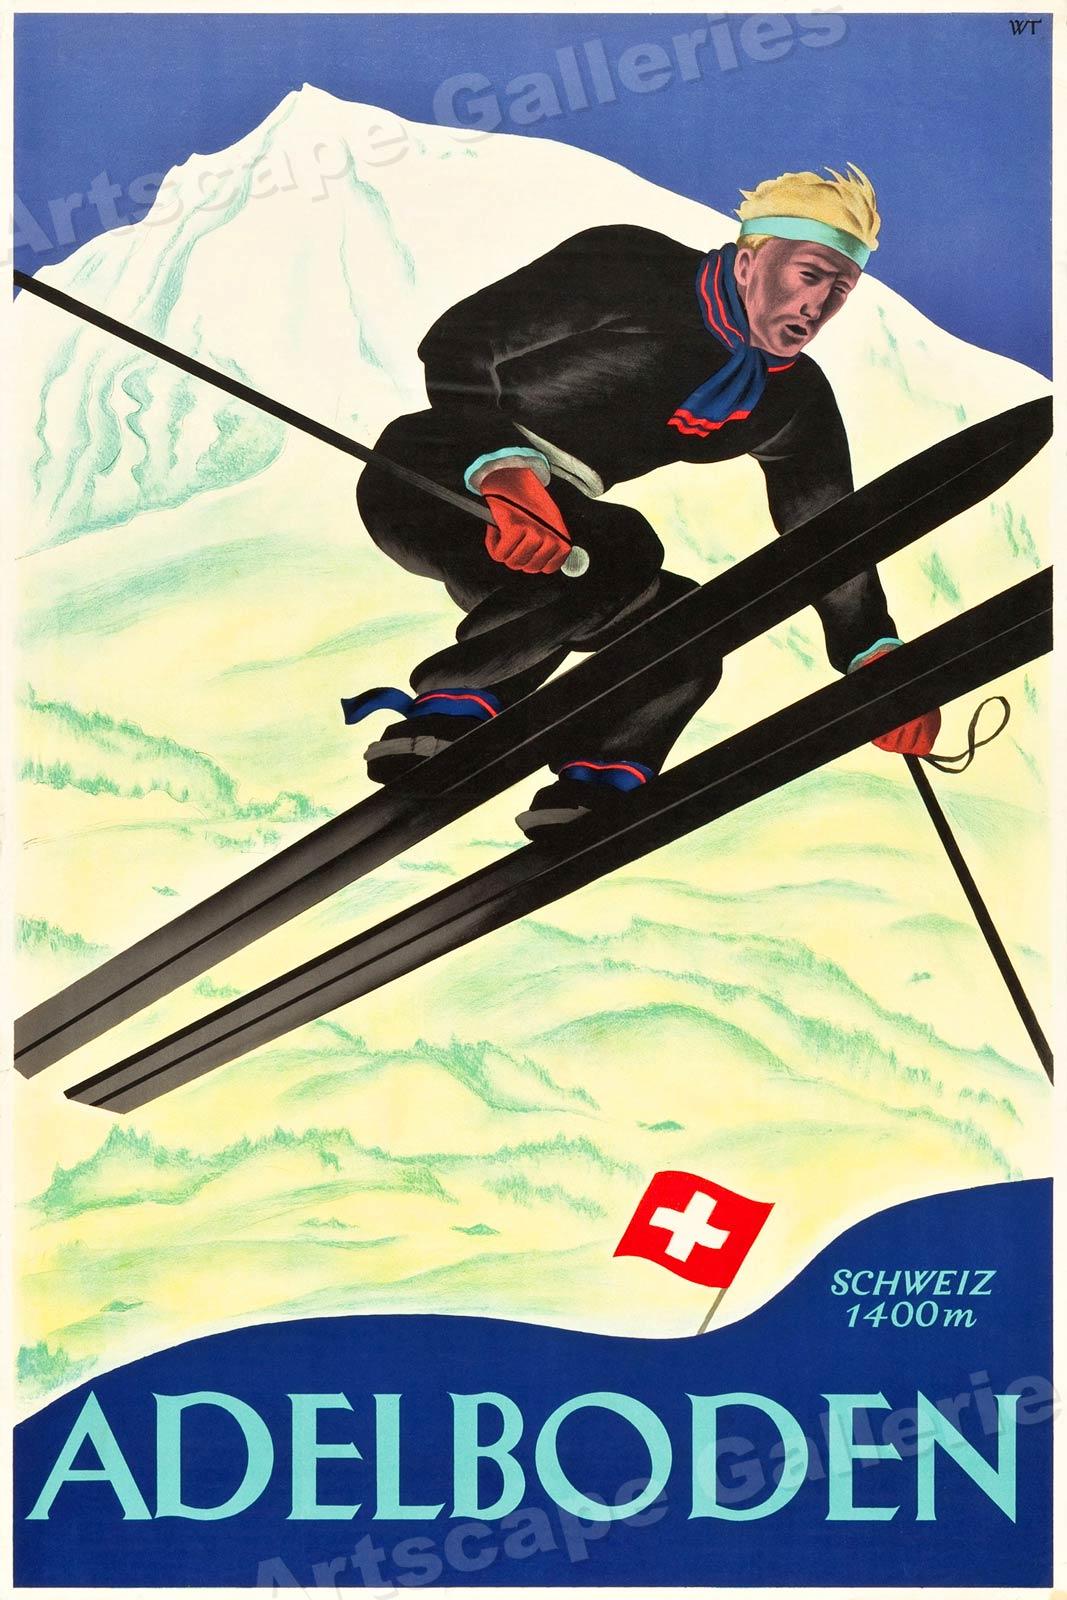 16x24 1920s Adelboden Vintage Style Switzerland Skiing Snow Poster